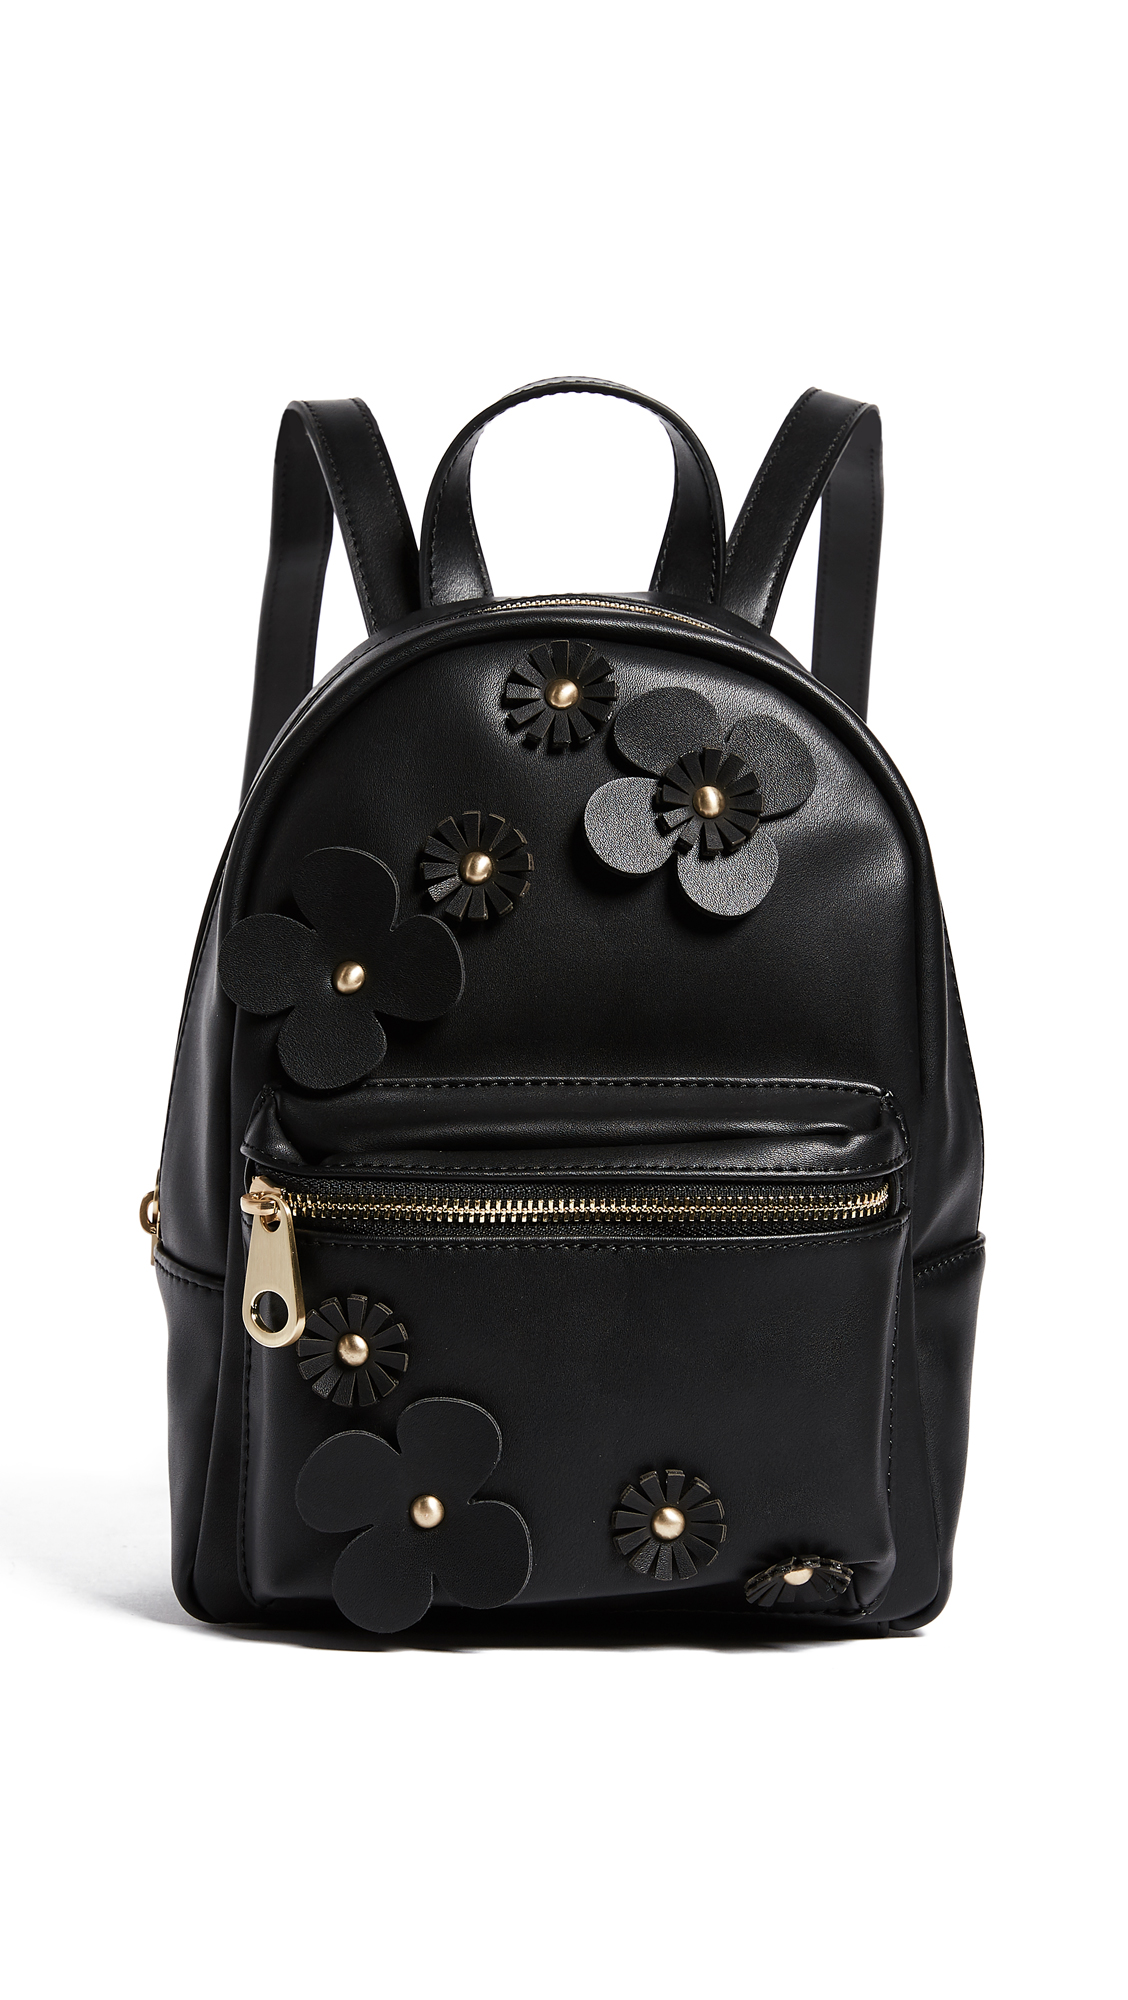 Studio 33 Floral Applique Mini Backpack - Black